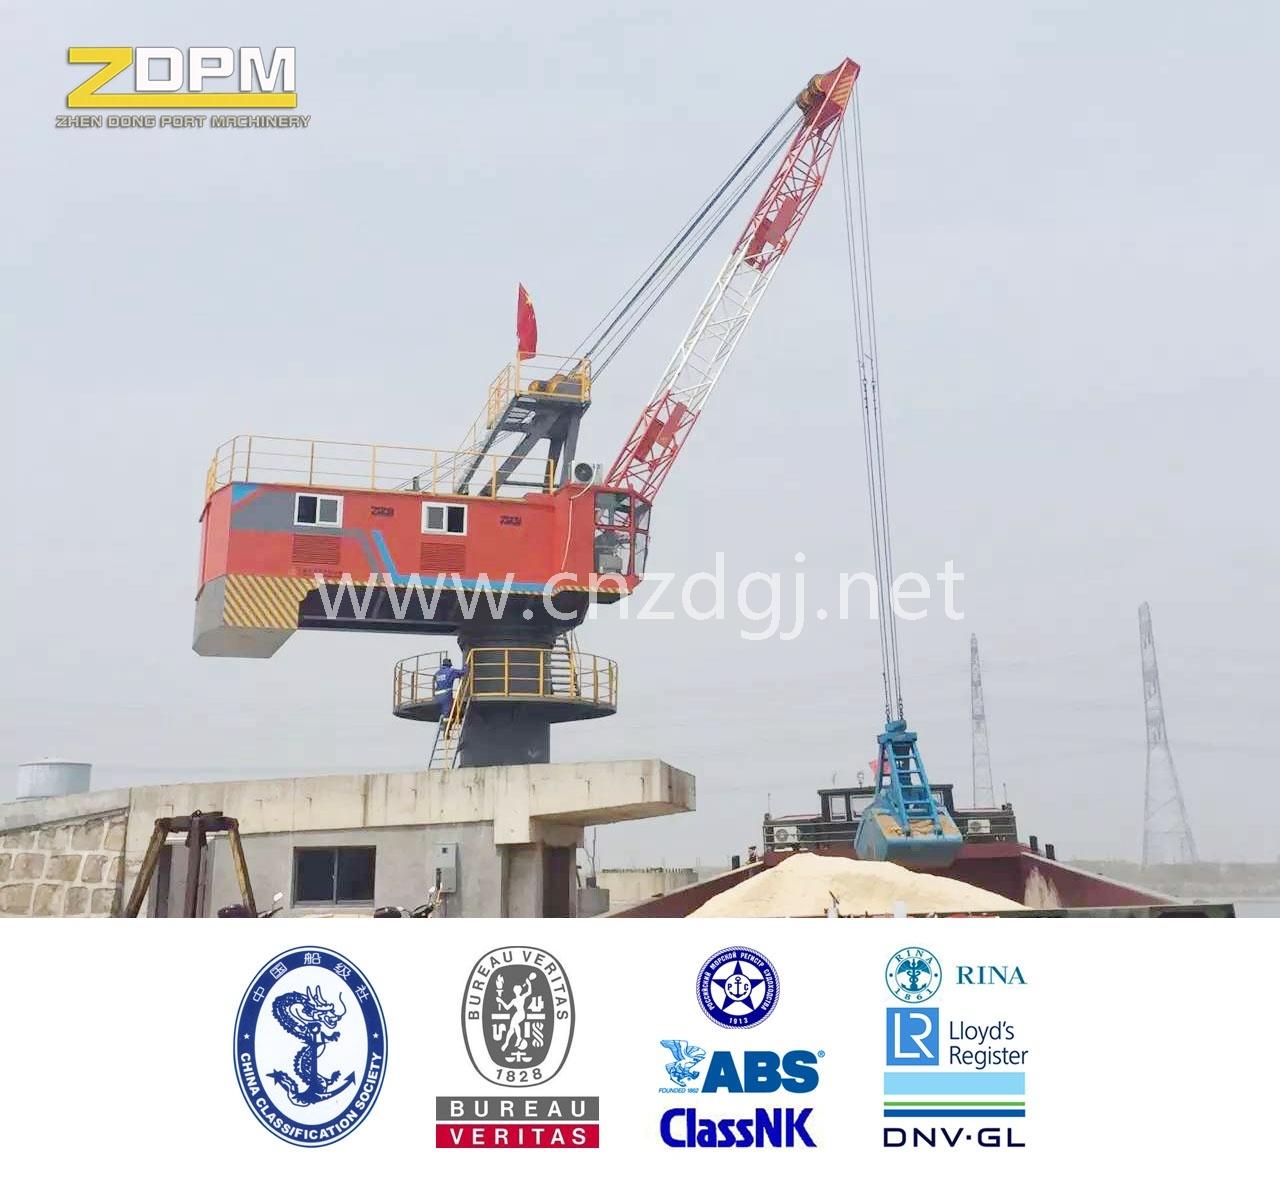 360degree Rotation Single Jib Portal Fixed Crane in Port for Loading